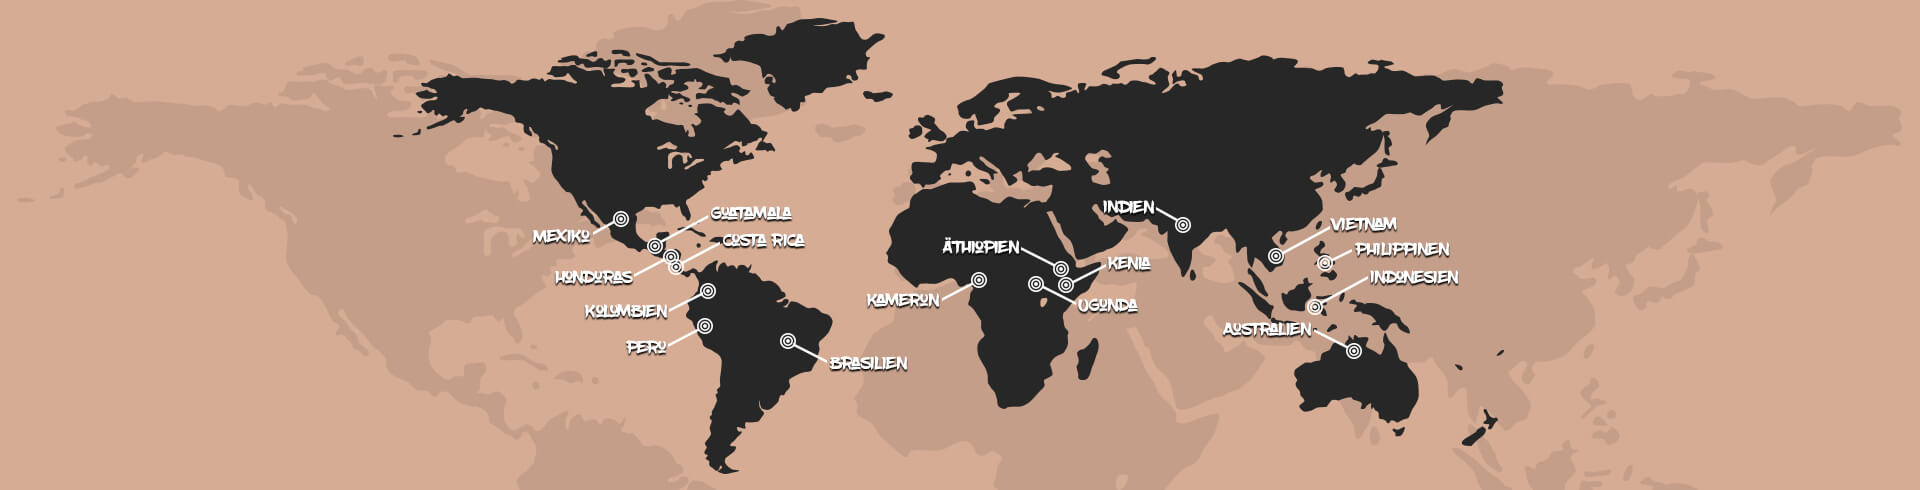 Landkarte - Roestkartell UG